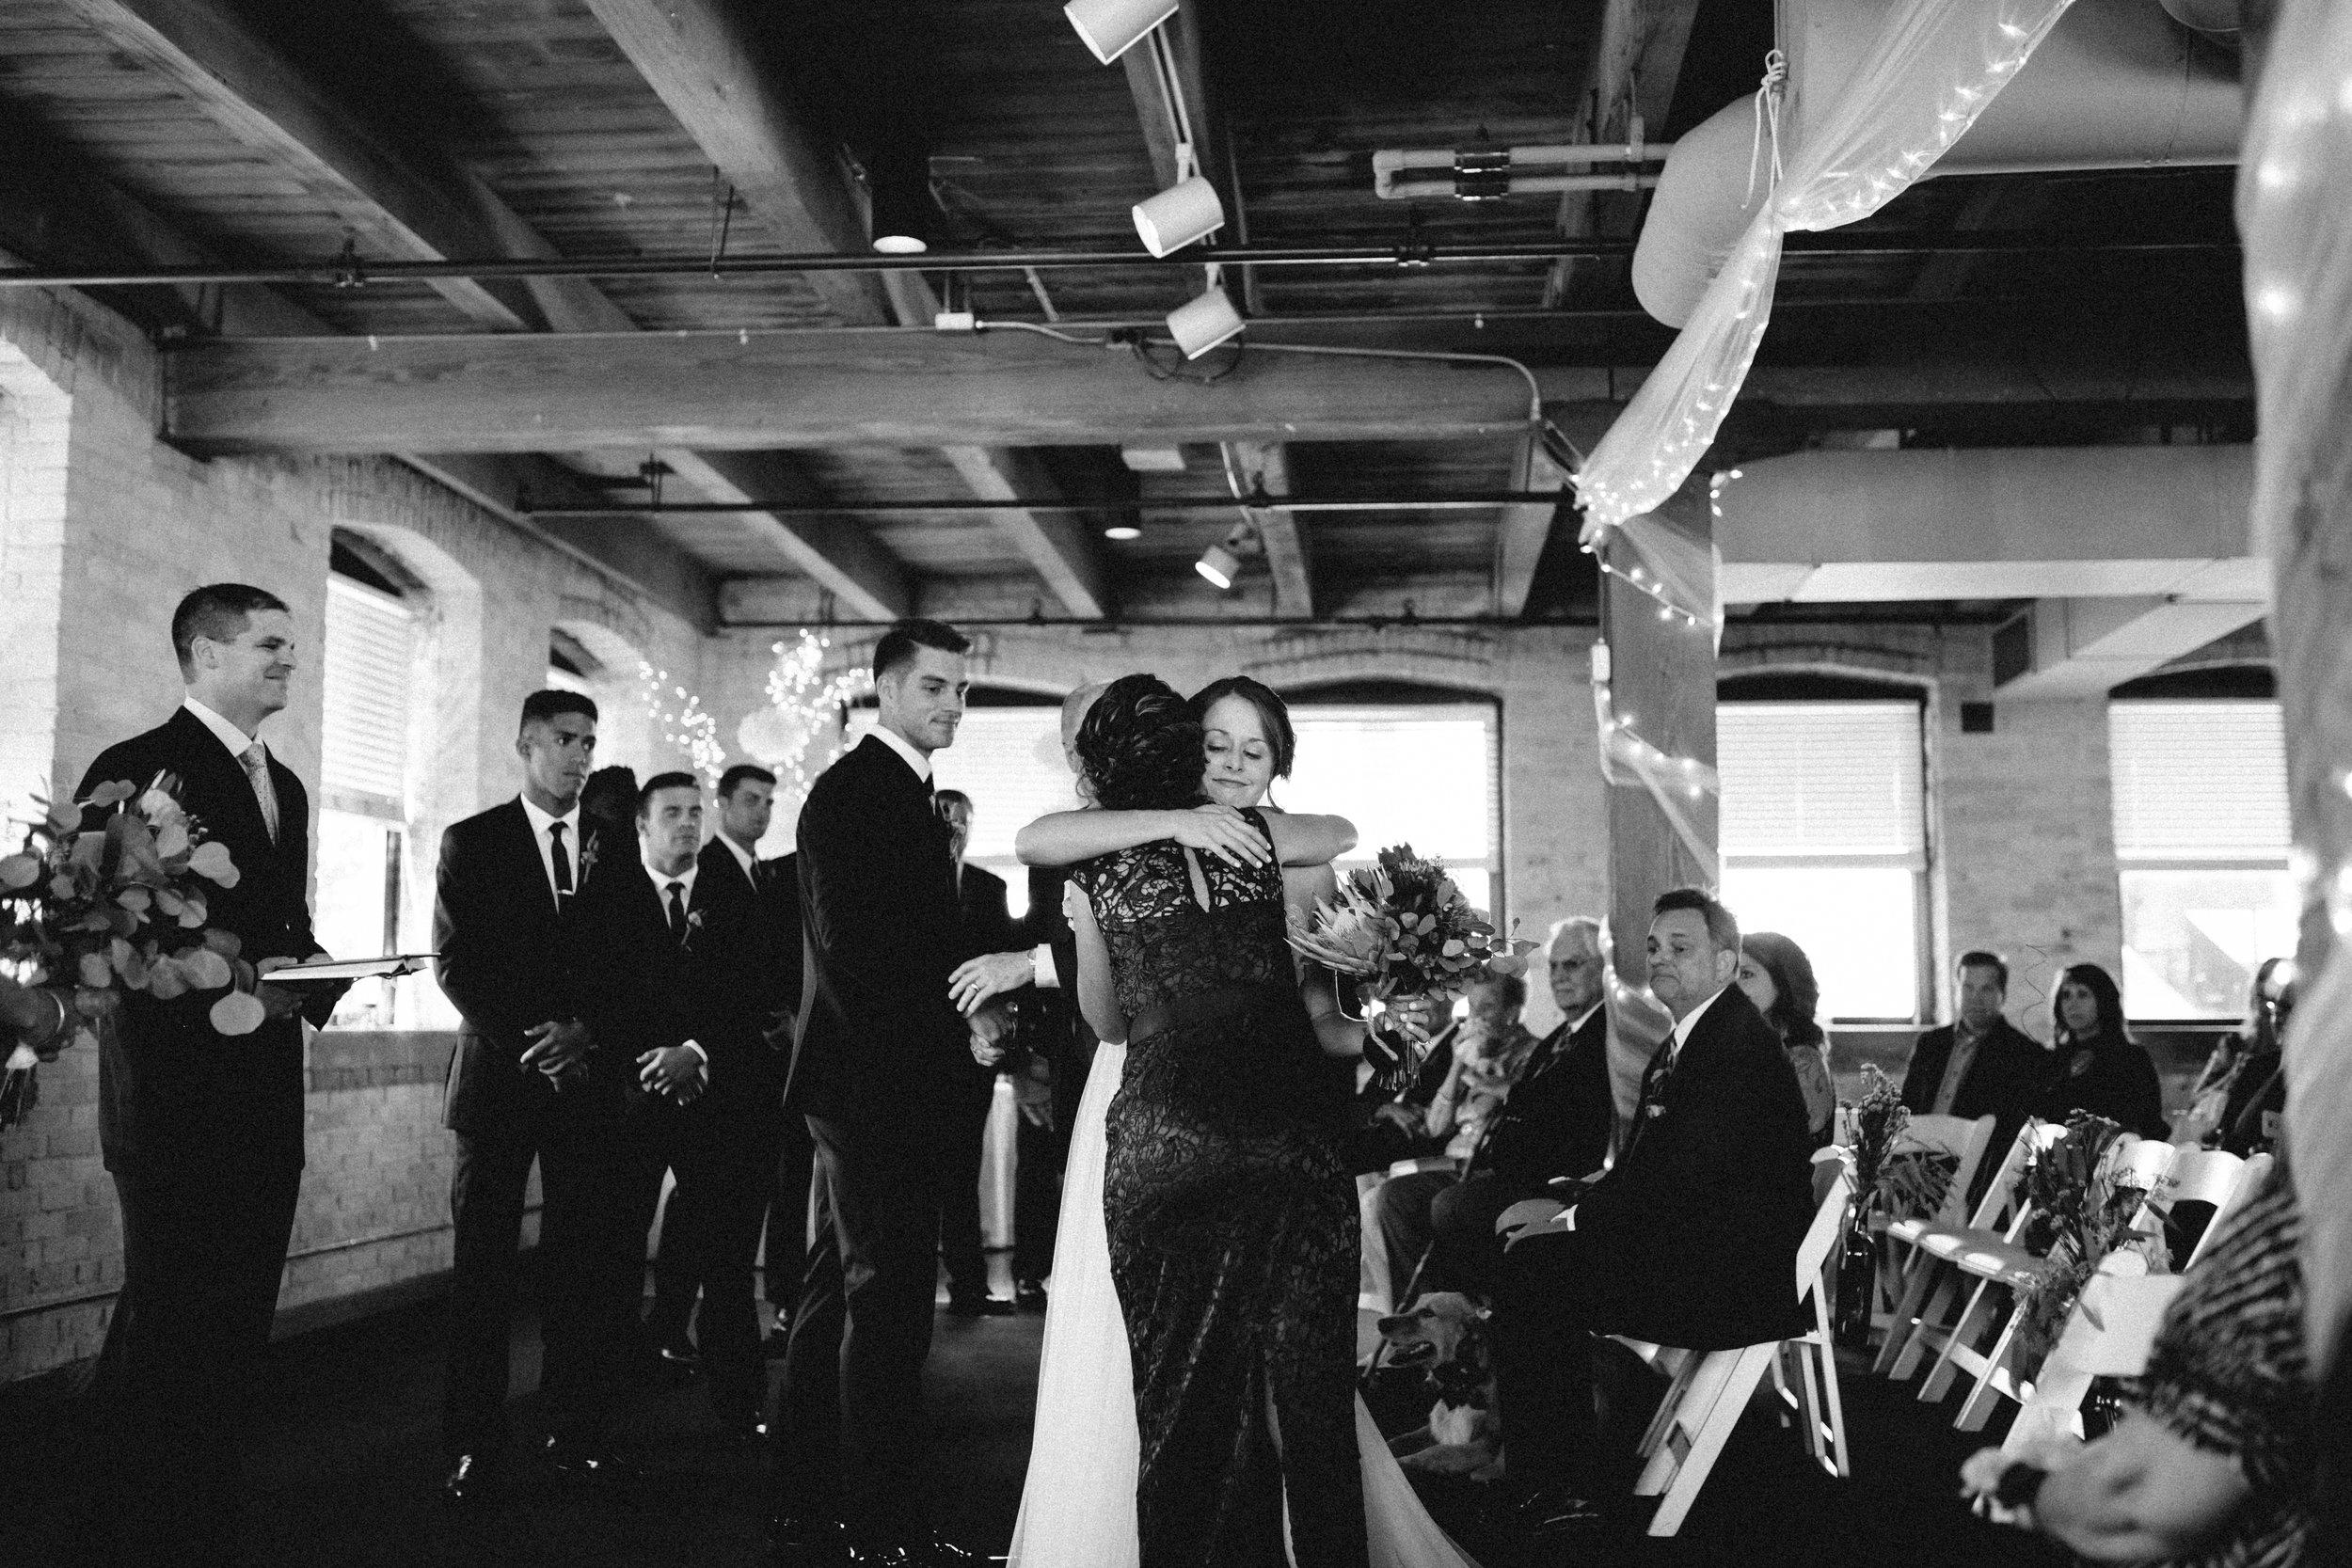 Industrial-Interior-Wedding-Ceremony-Photographer-02